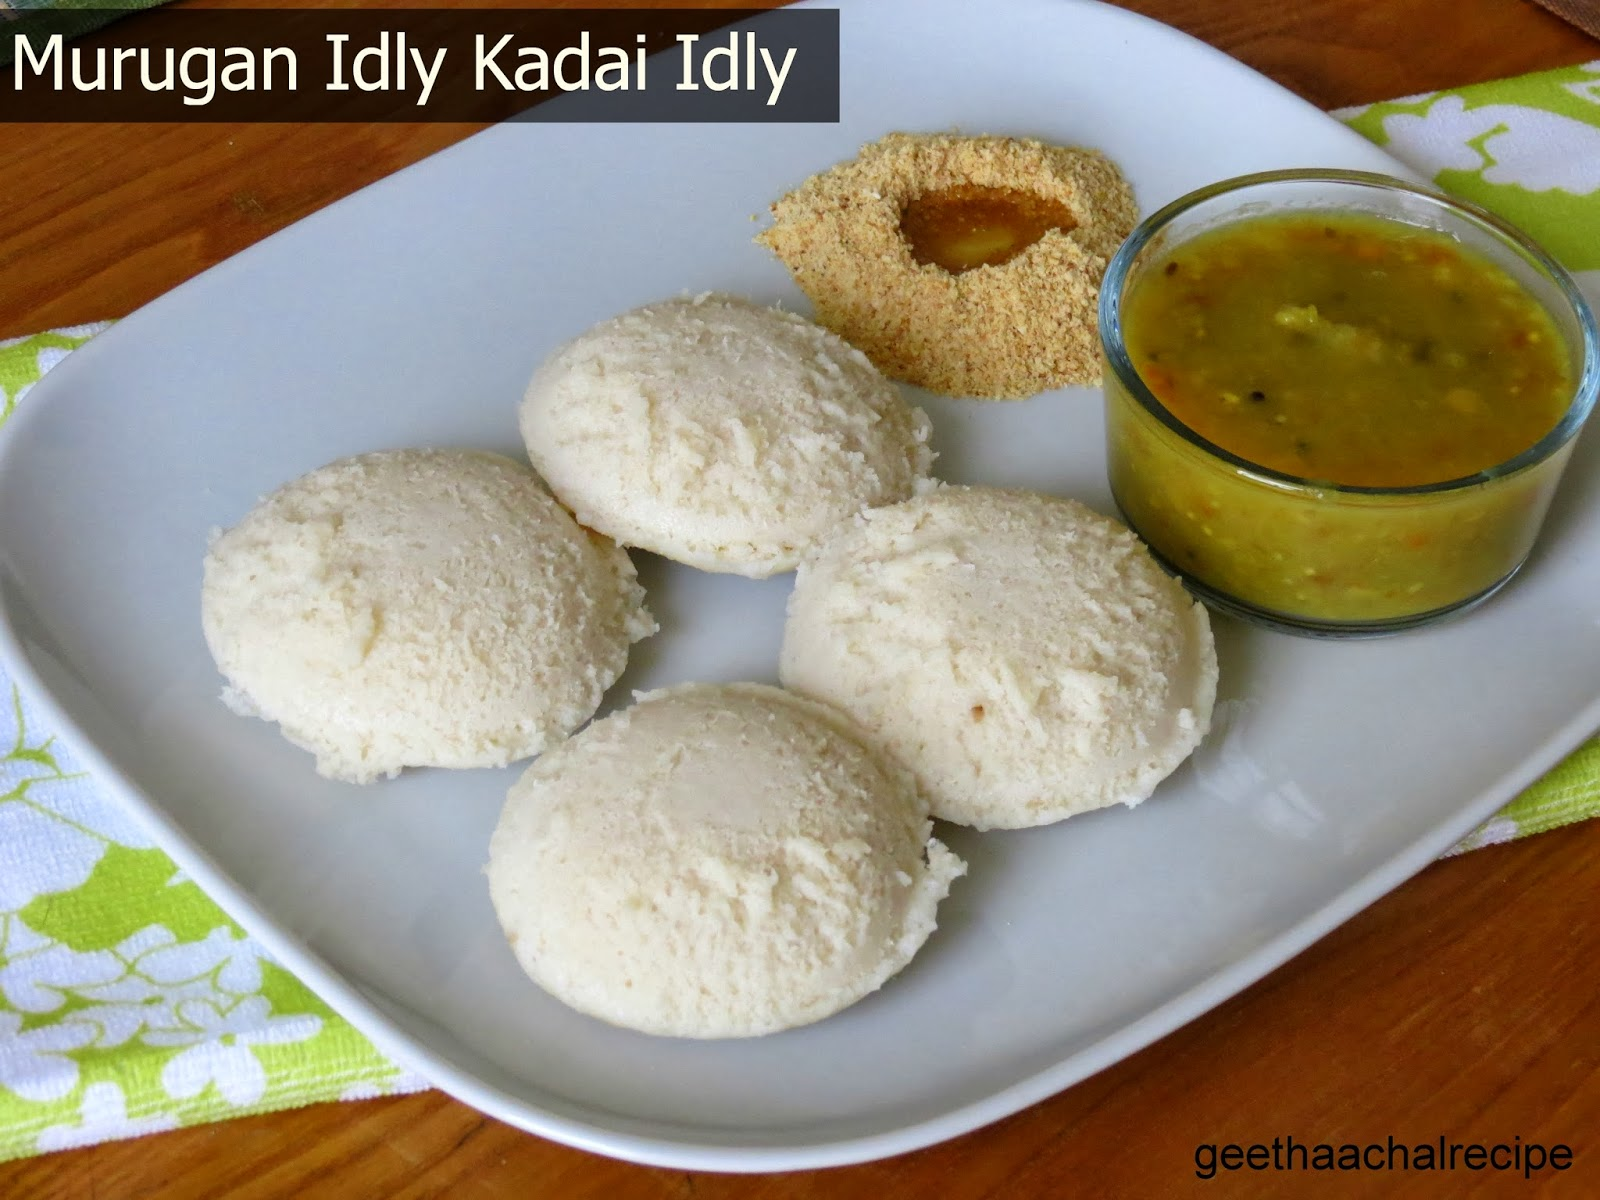 Murugan Idly Kadai